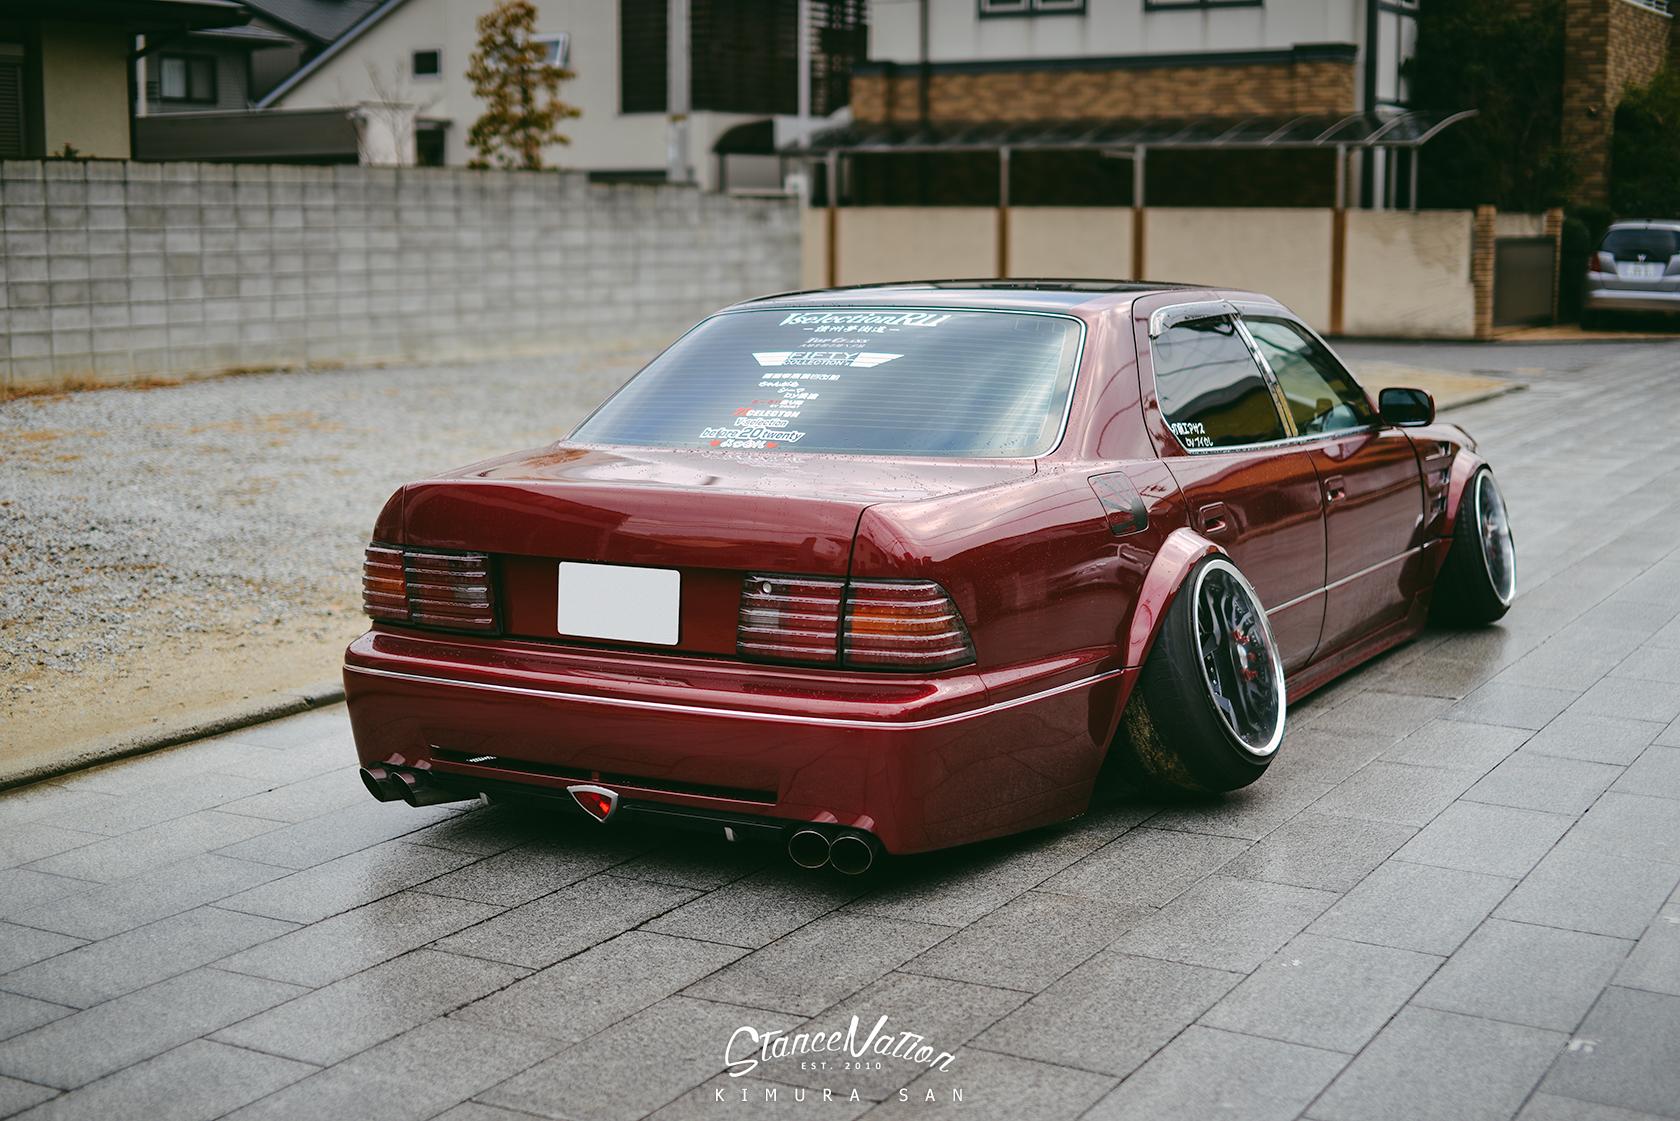 oni-camber-lexus-ls400-japan-vip-9